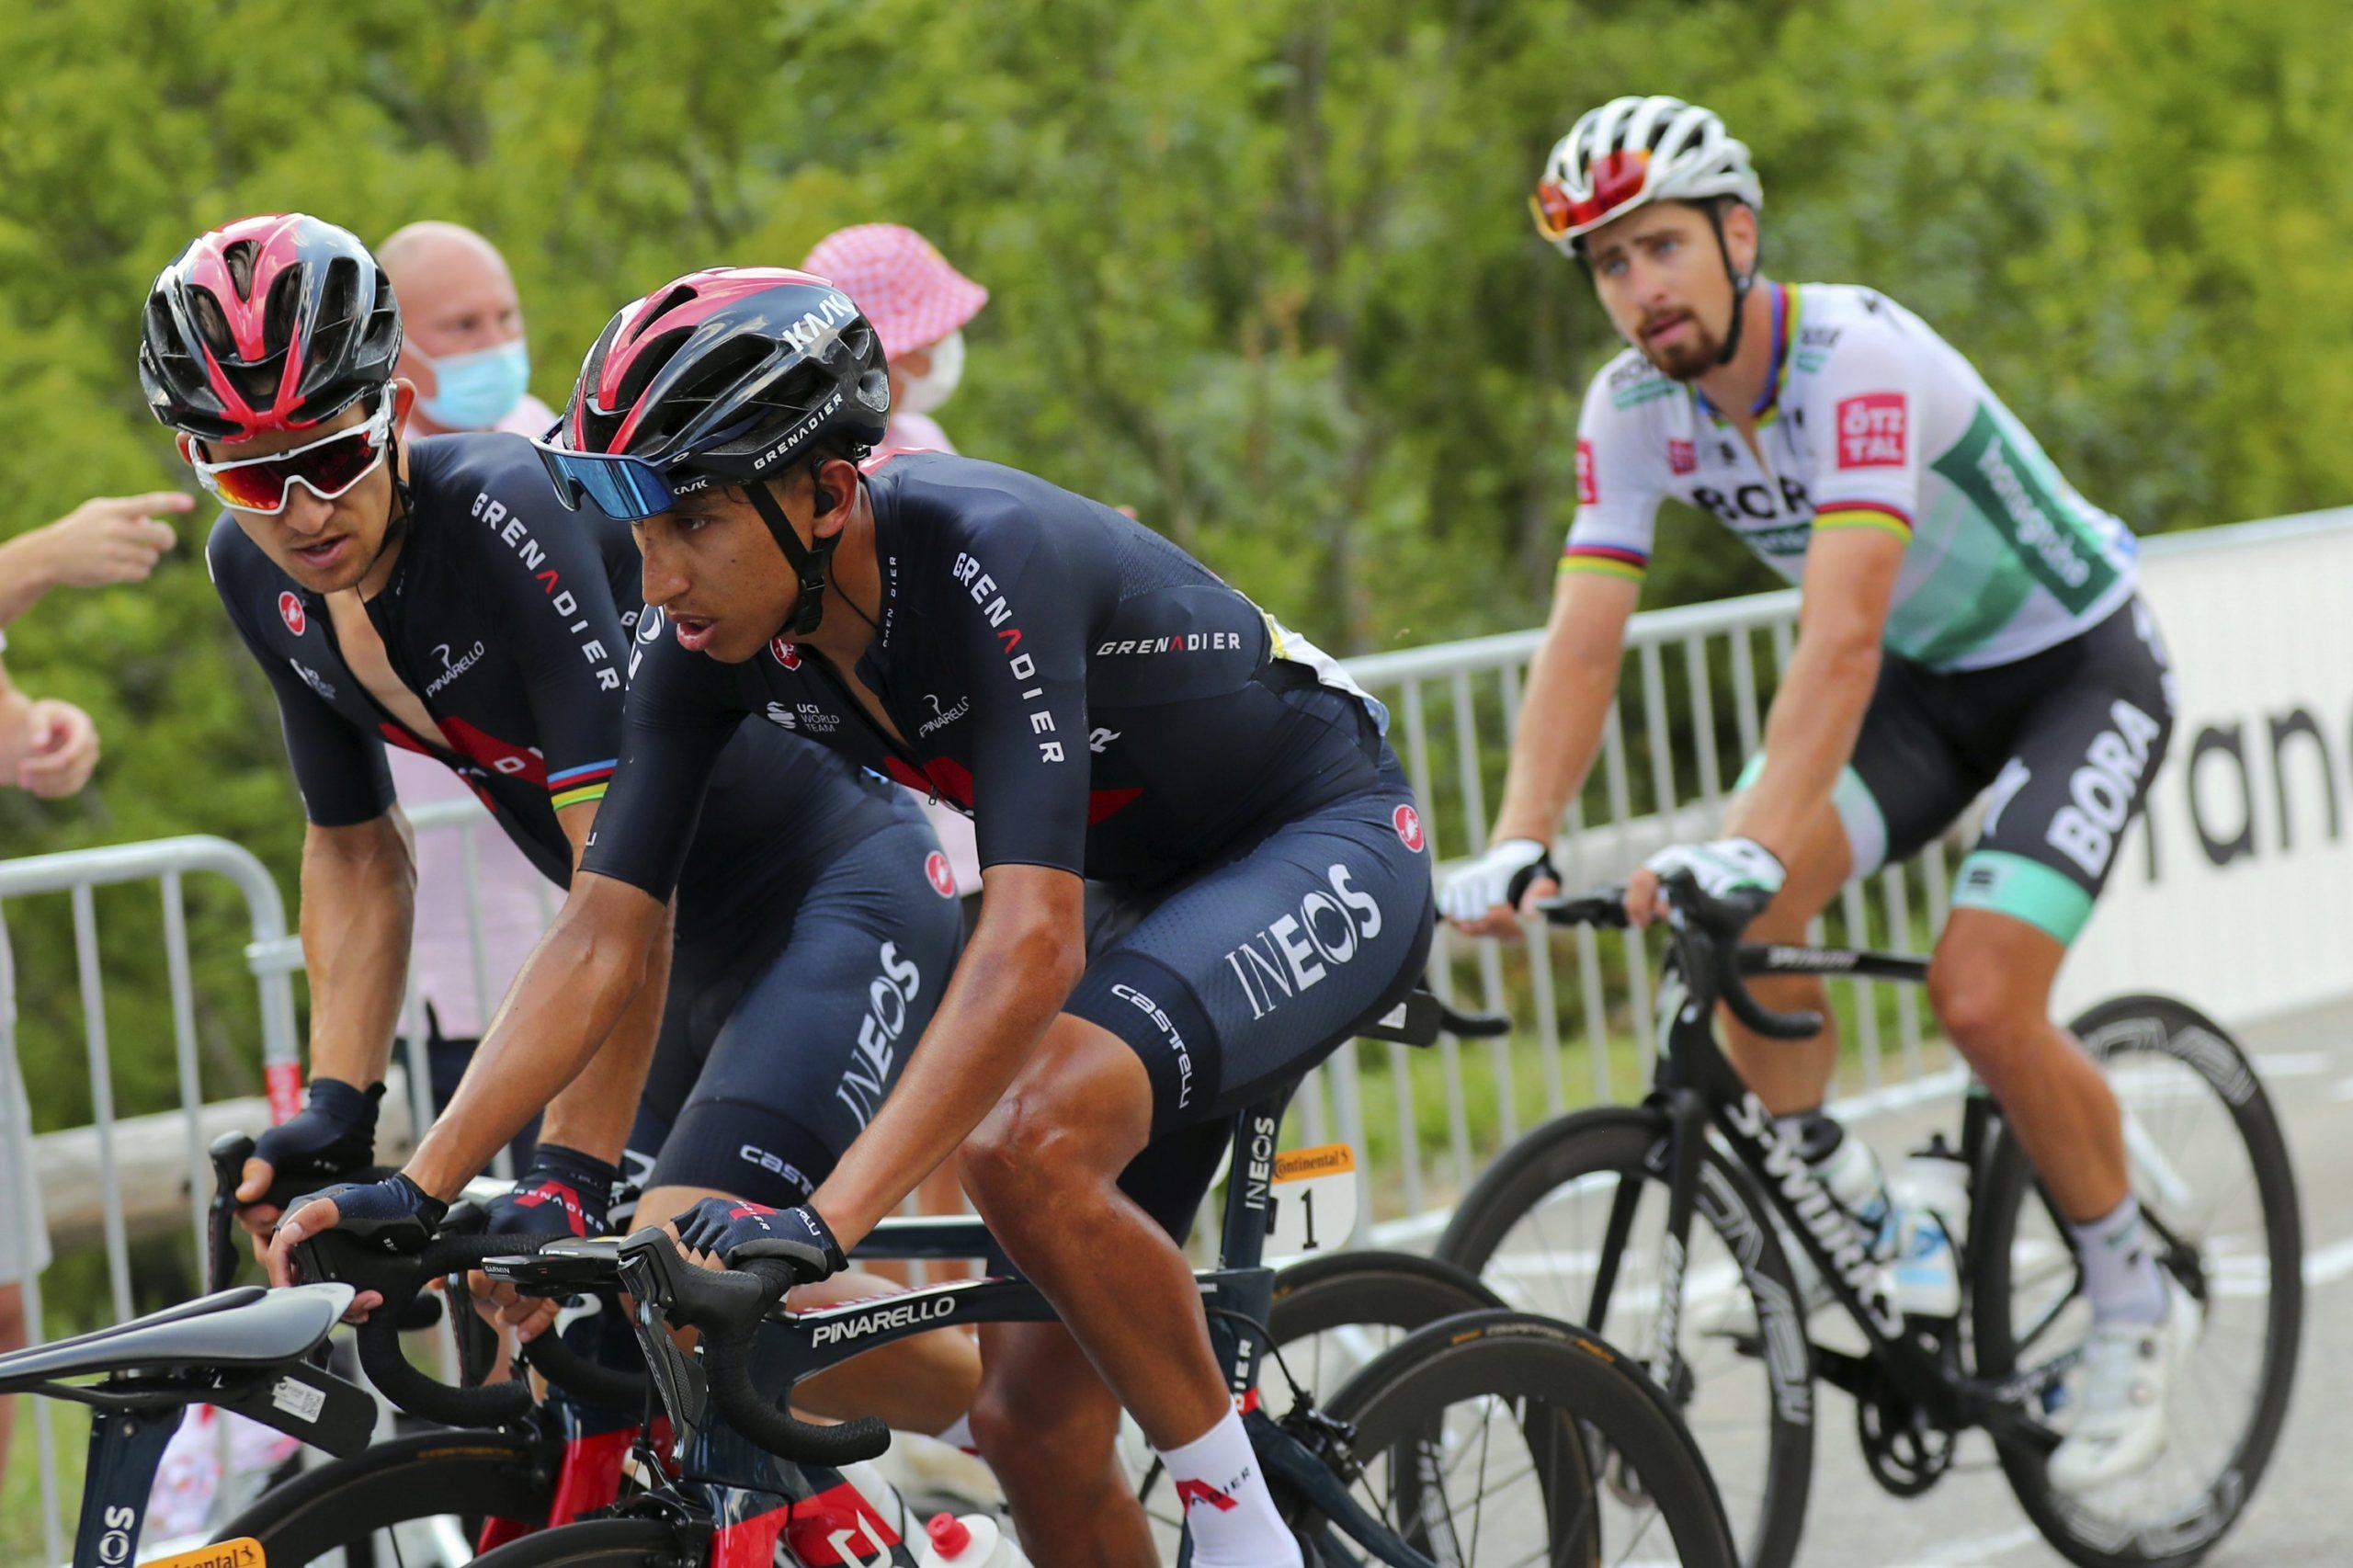 Defending champion Egan Bernal withdraws from the Tour de France